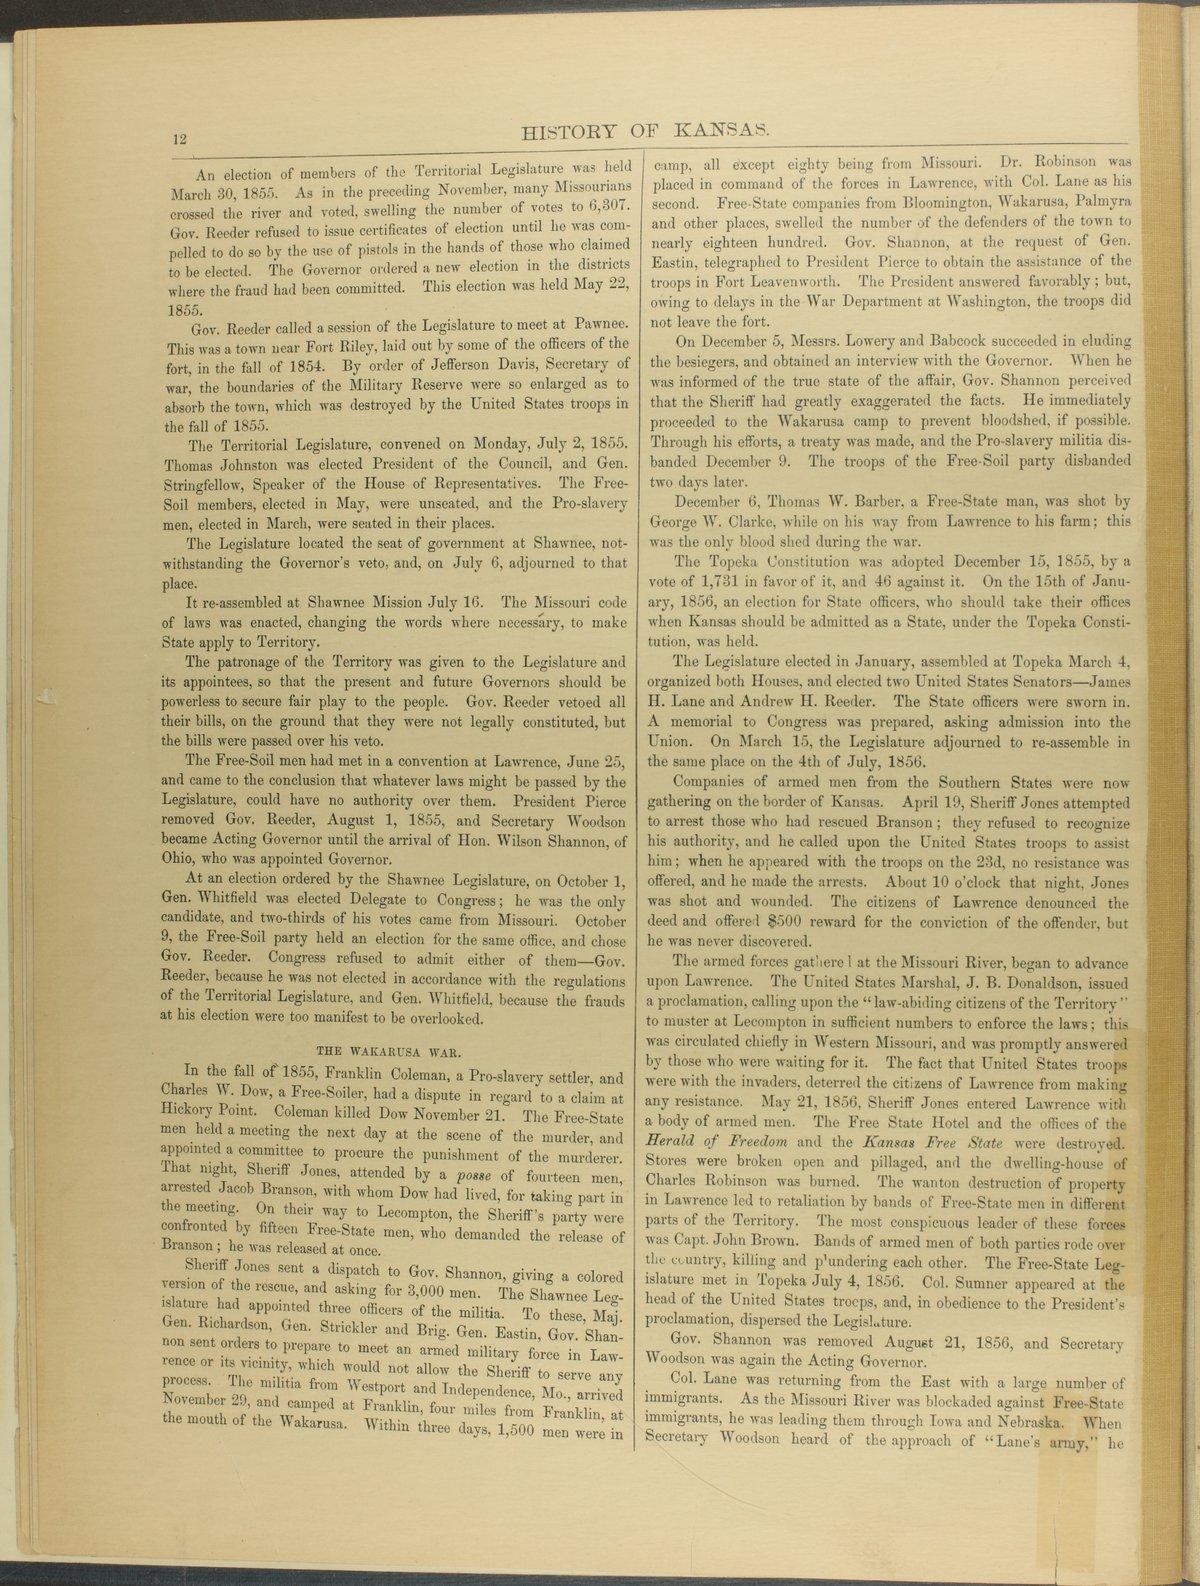 Historical plat book of Riley County, Kansas - 12